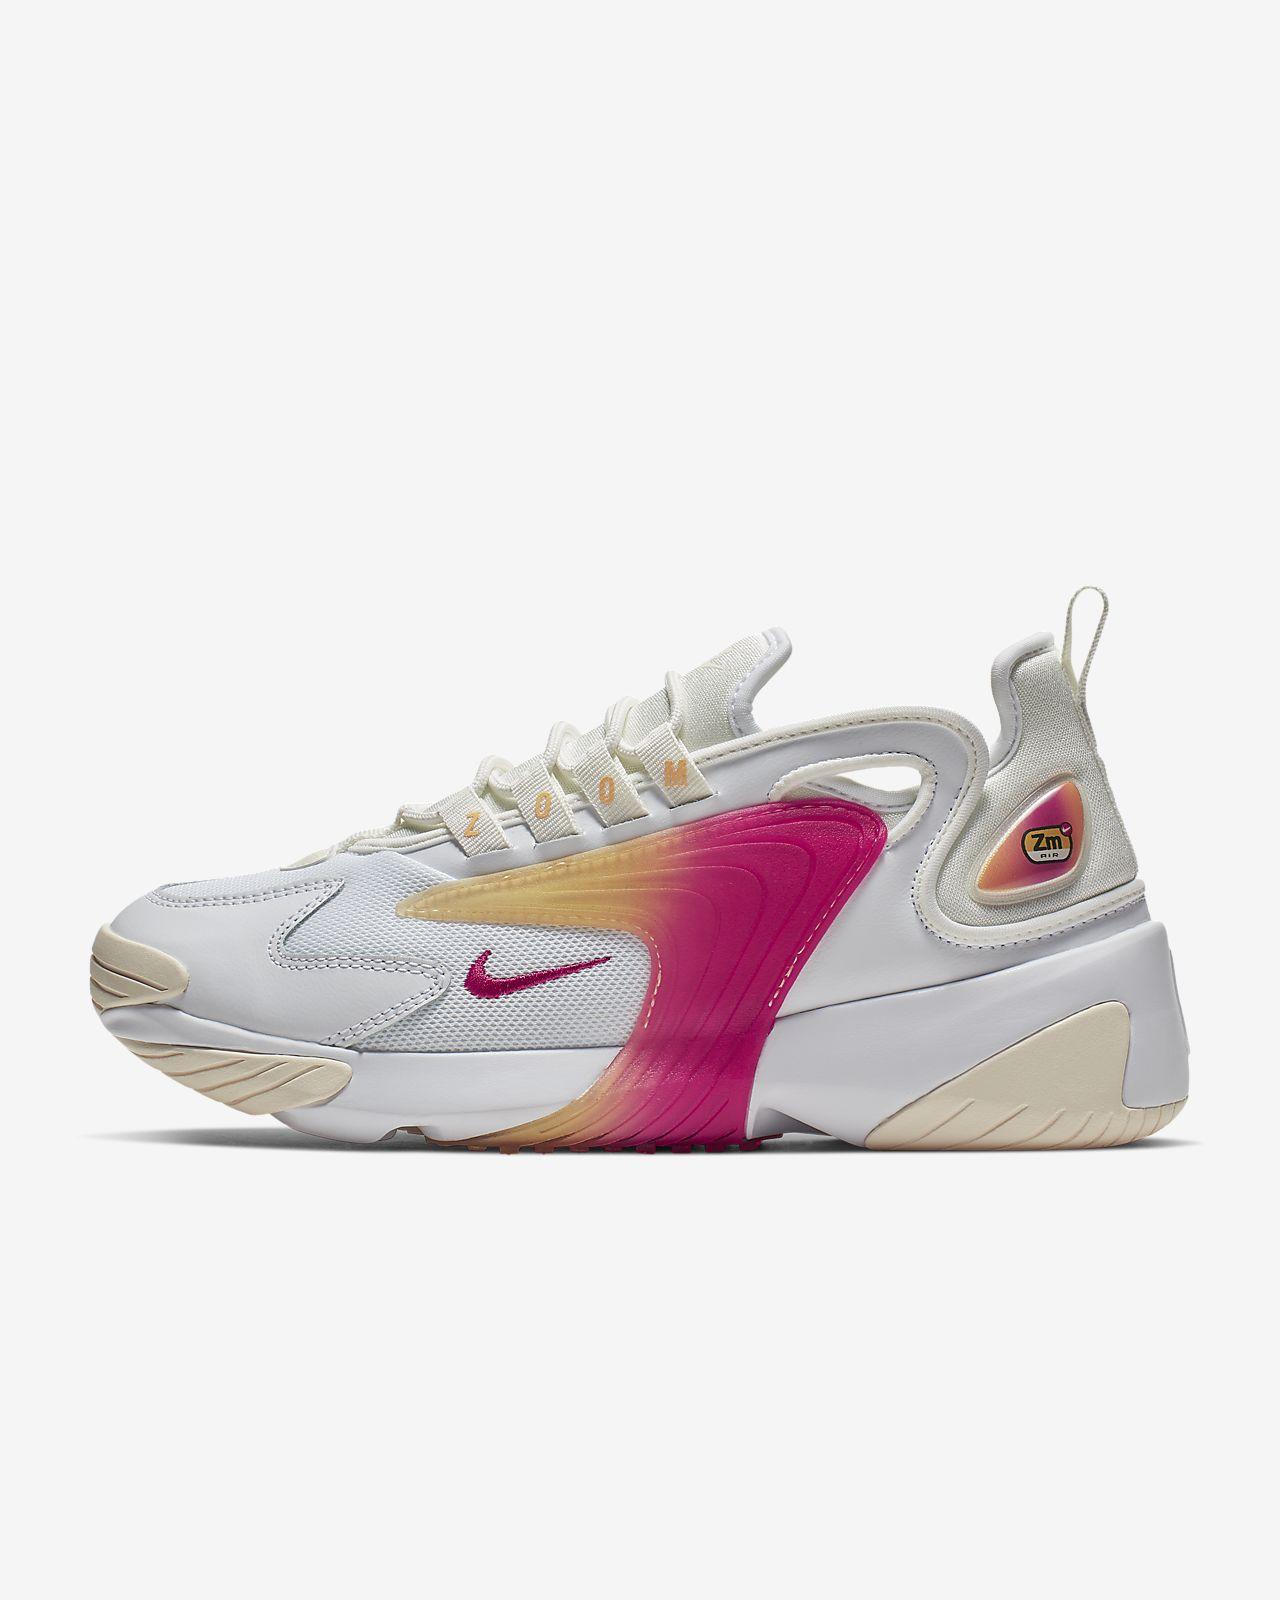 finest selection f0db5 27339 ... Calzado para mujer Nike Zoom 2K